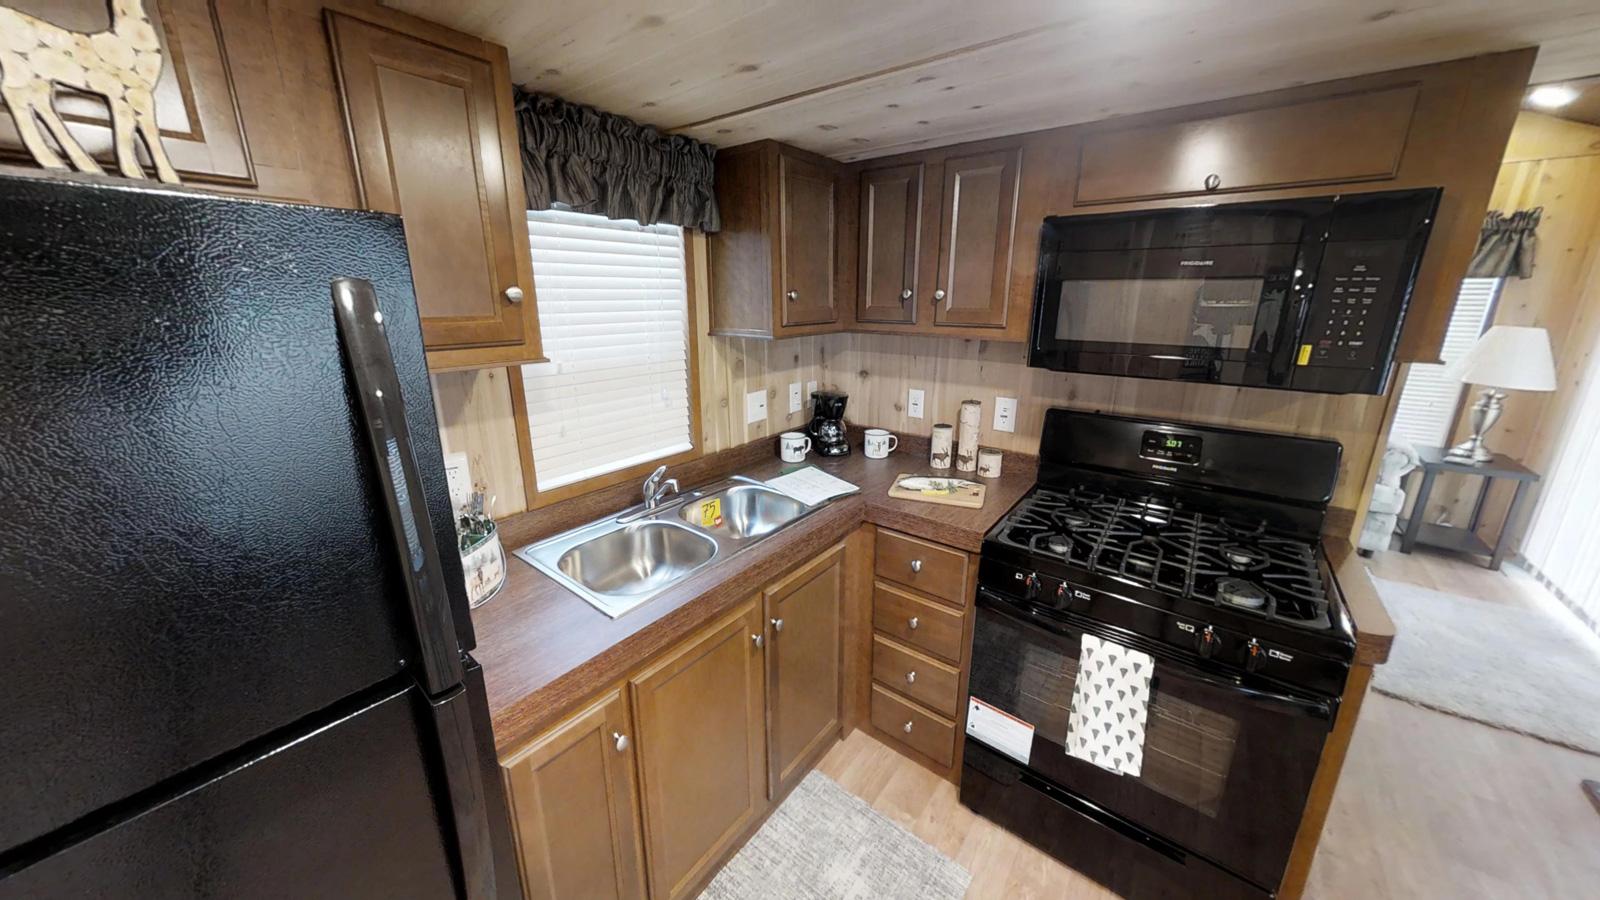 Americas-Park-Cabins-Lodge-Series-39-ND-10052018_095543